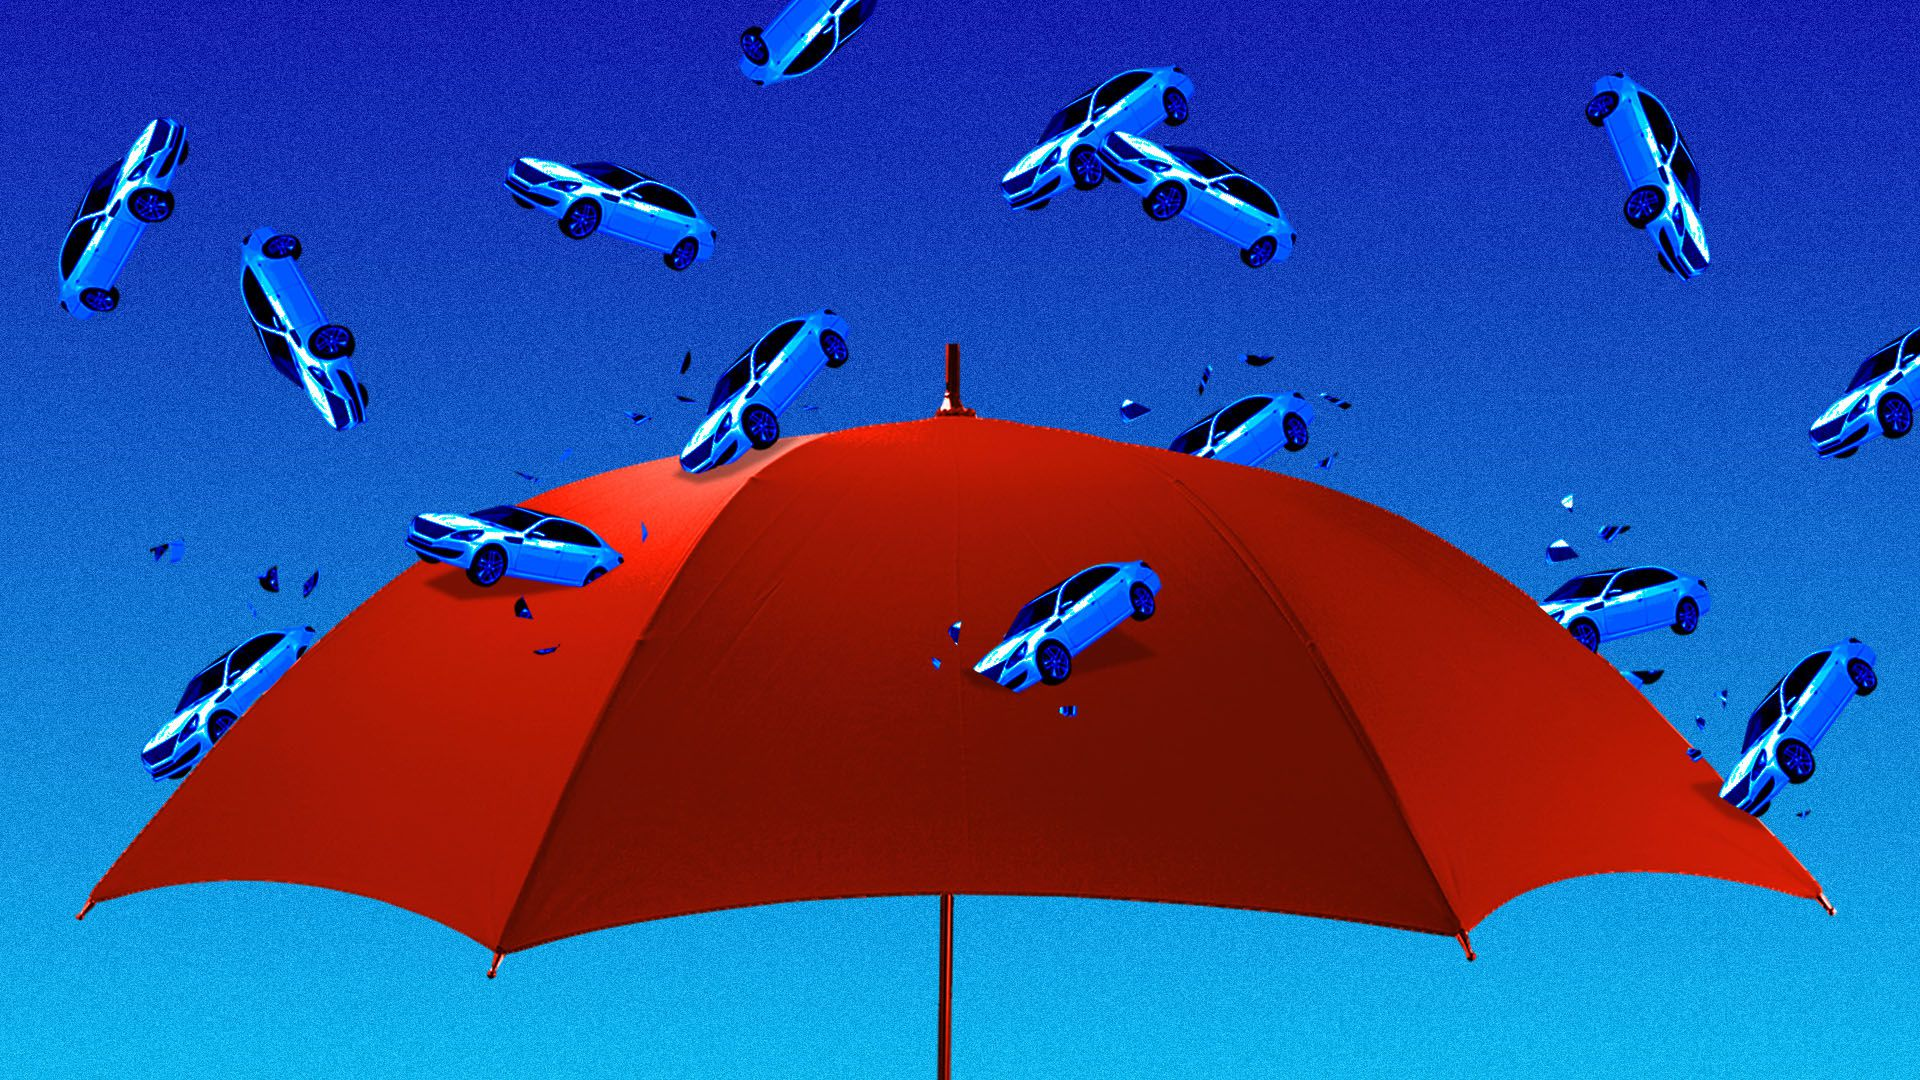 Illustration of car crashing against a giant umbrella